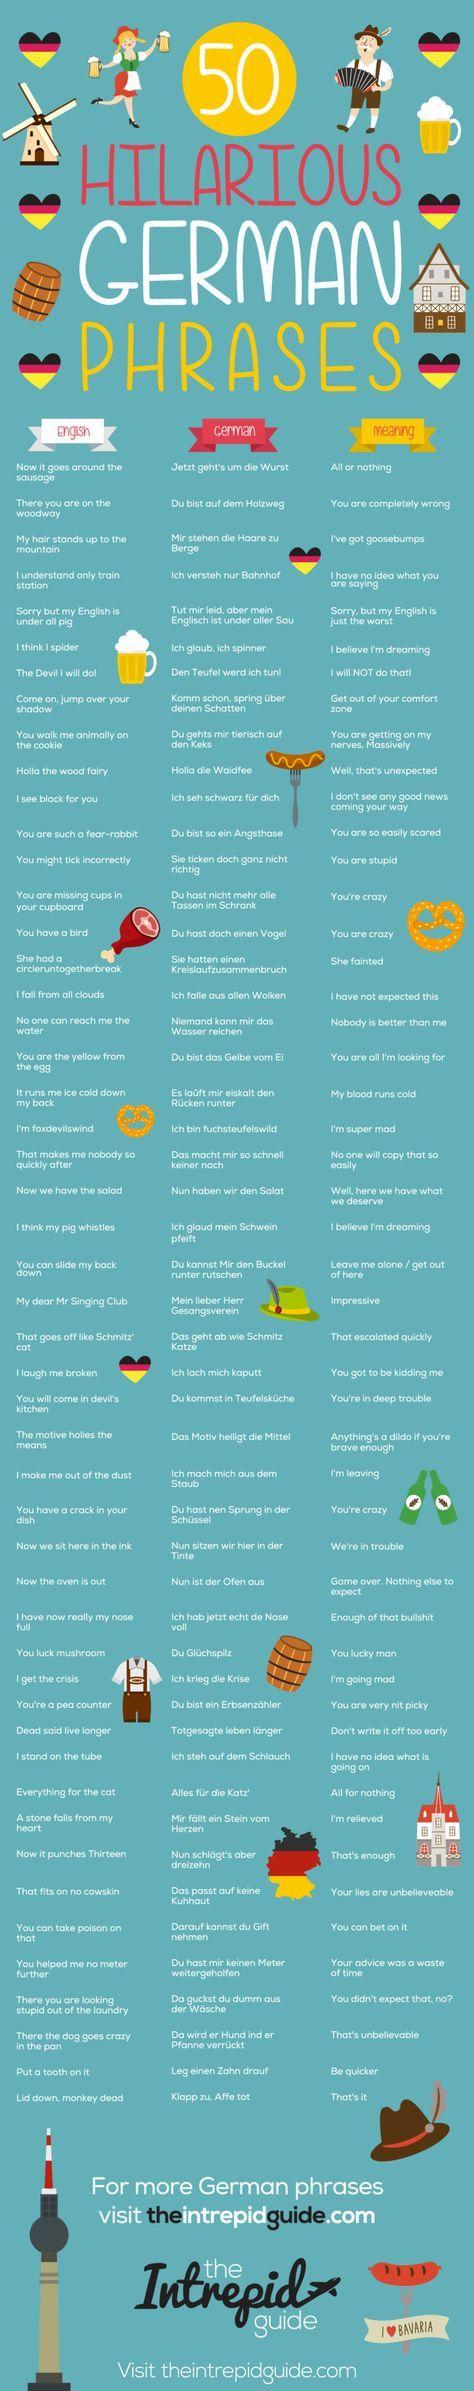 50 Amusing German Phrases That Will Brighten Your Day